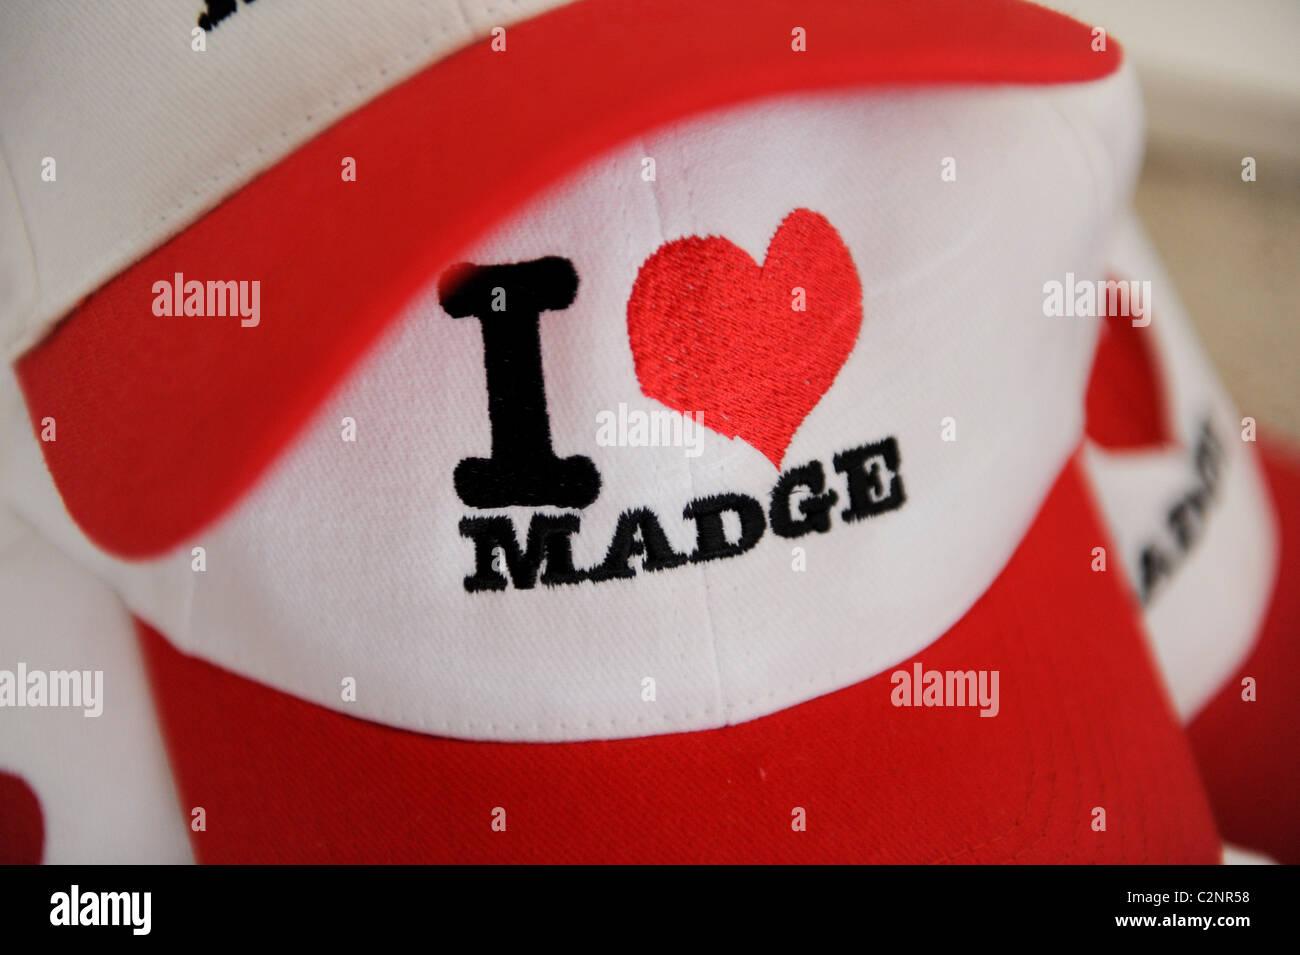 Madonna memorabilia - Stock Image